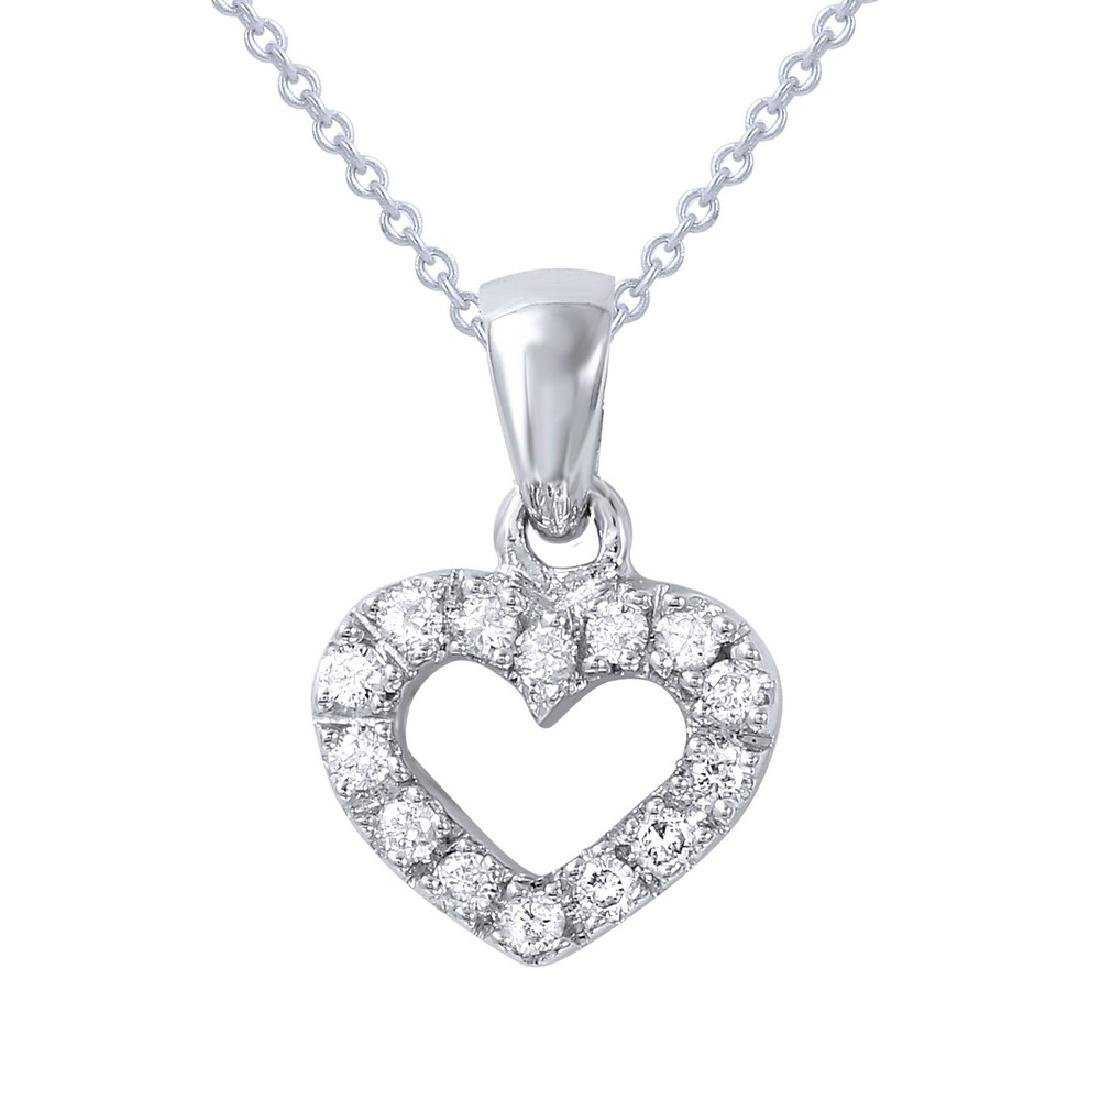 Genuine 0.13 TCW 14K White Gold Ladies Necklace